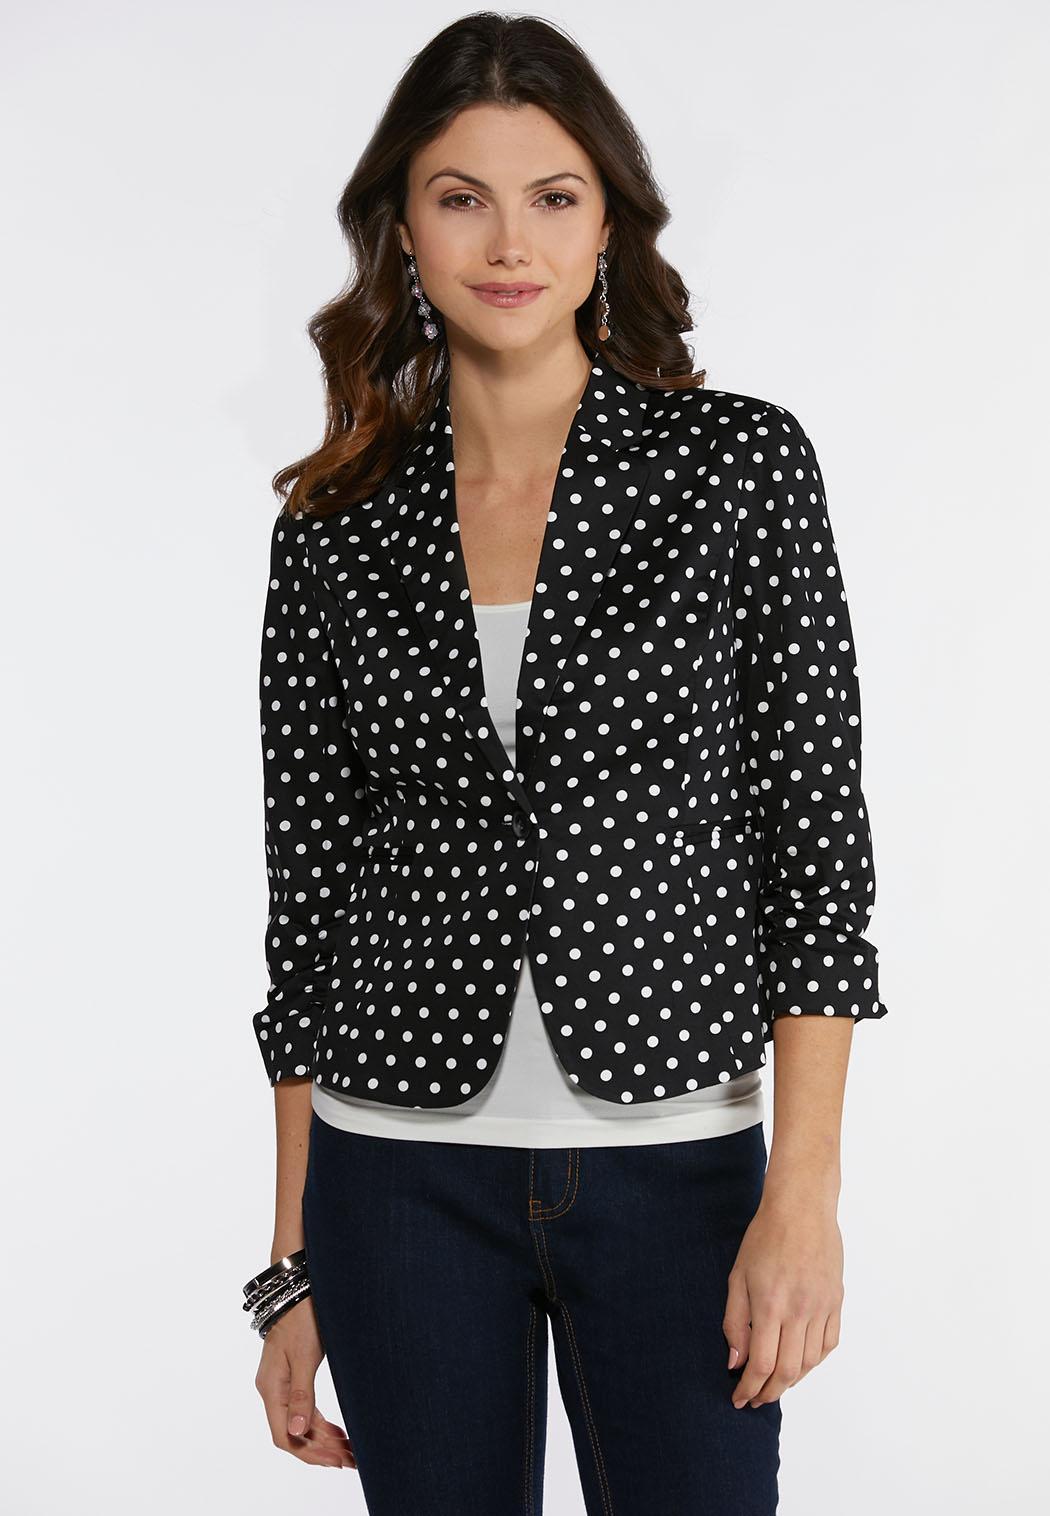 Plus Size Polka Dotted Blazer Fashion Jackets Cato Fashions